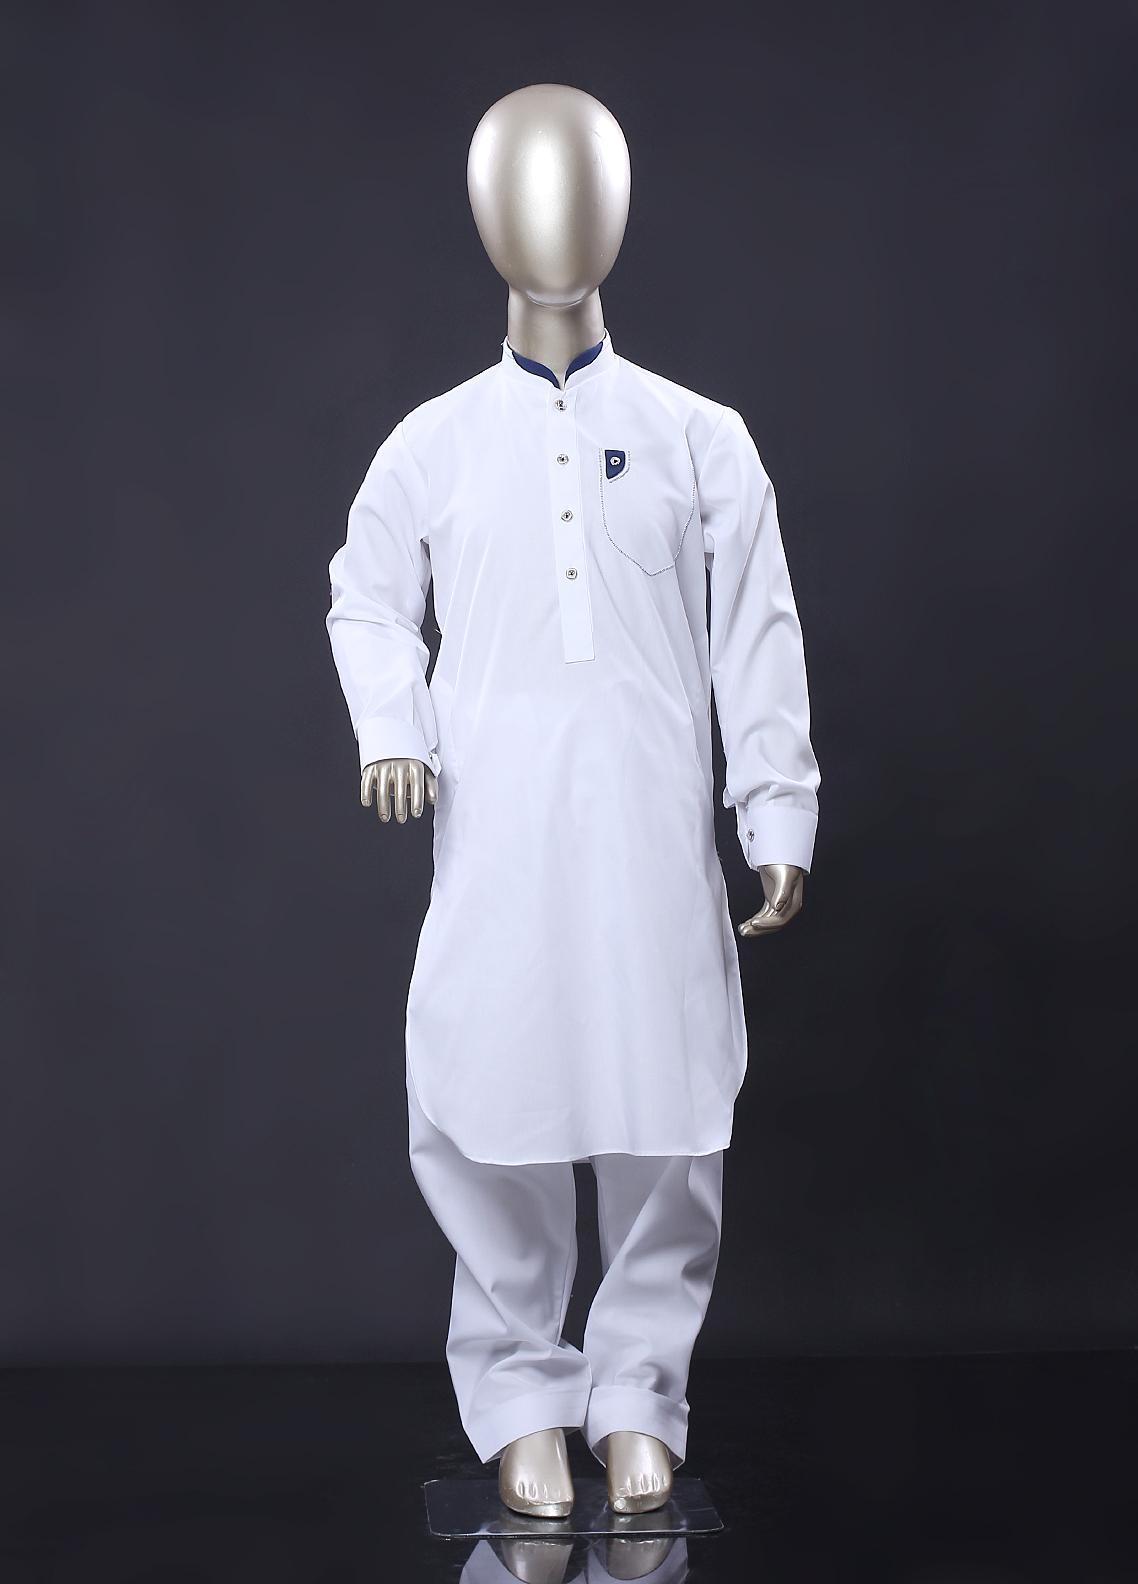 Aizaz Zafar Cotton Formal Kameez Shalwar for Boys -  256 White